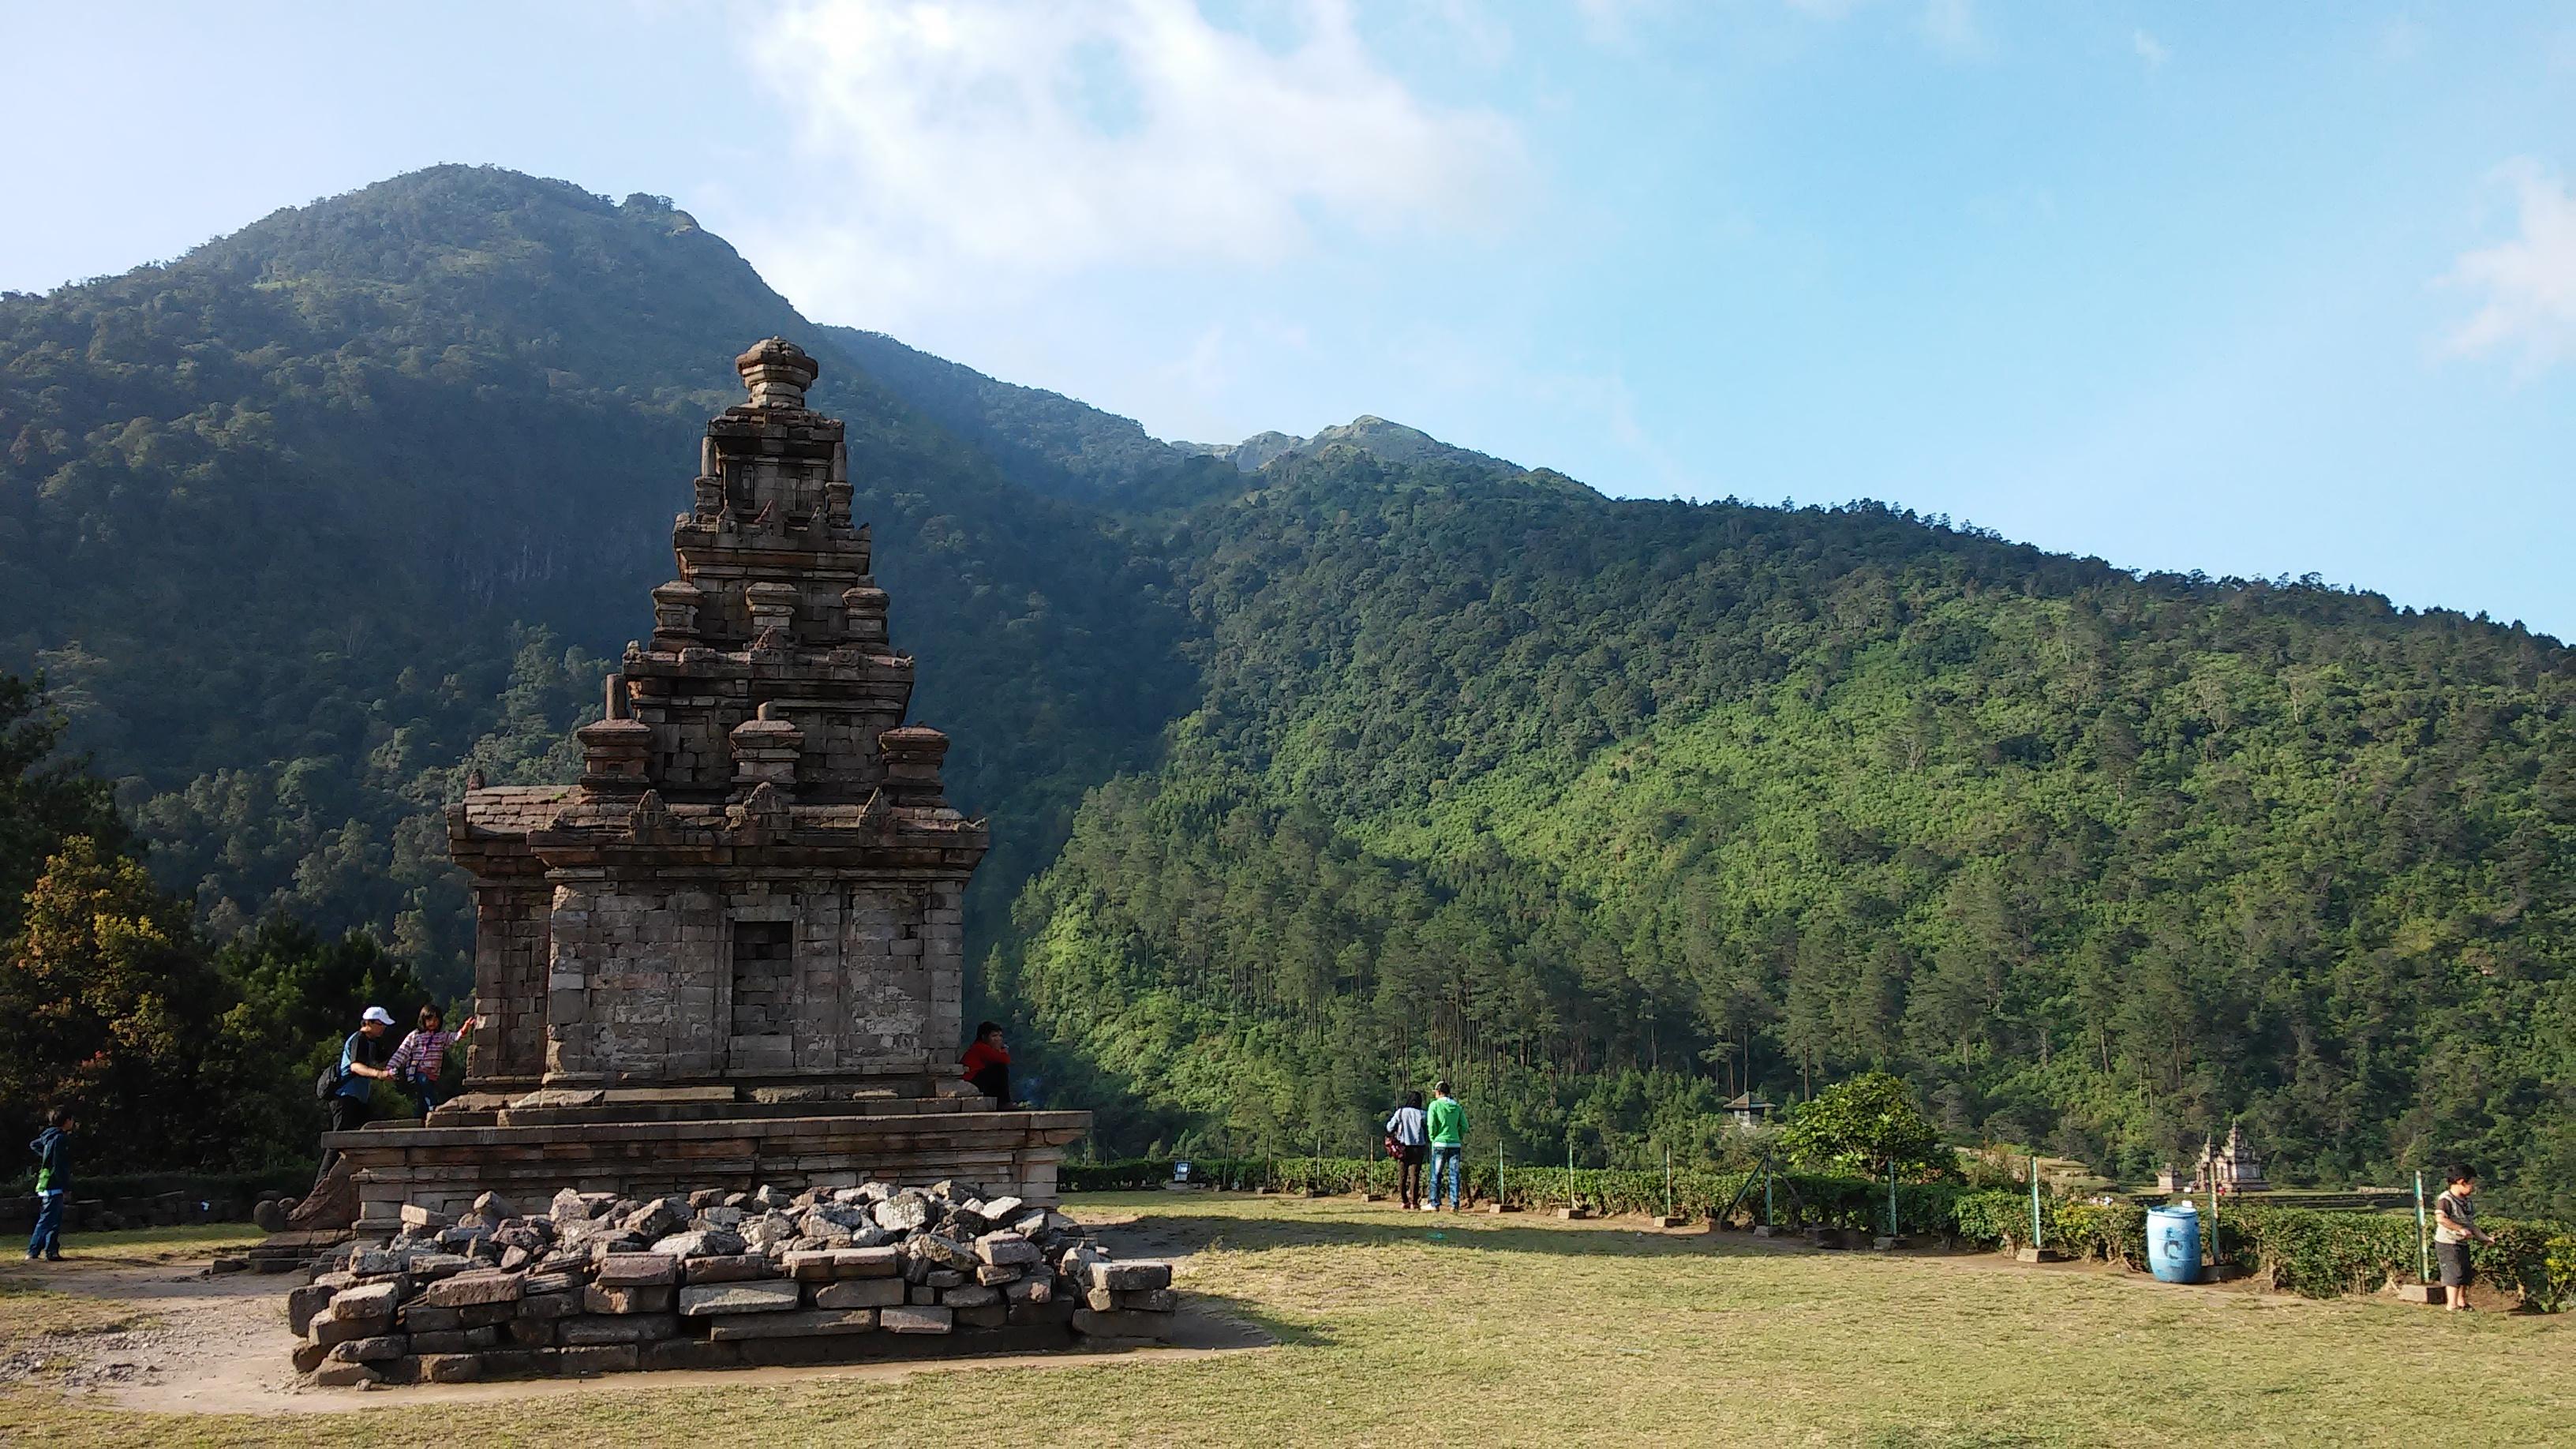 Candi Gedong Songo Semarang Indahnya Negeri Atas Awan Berada Lereng